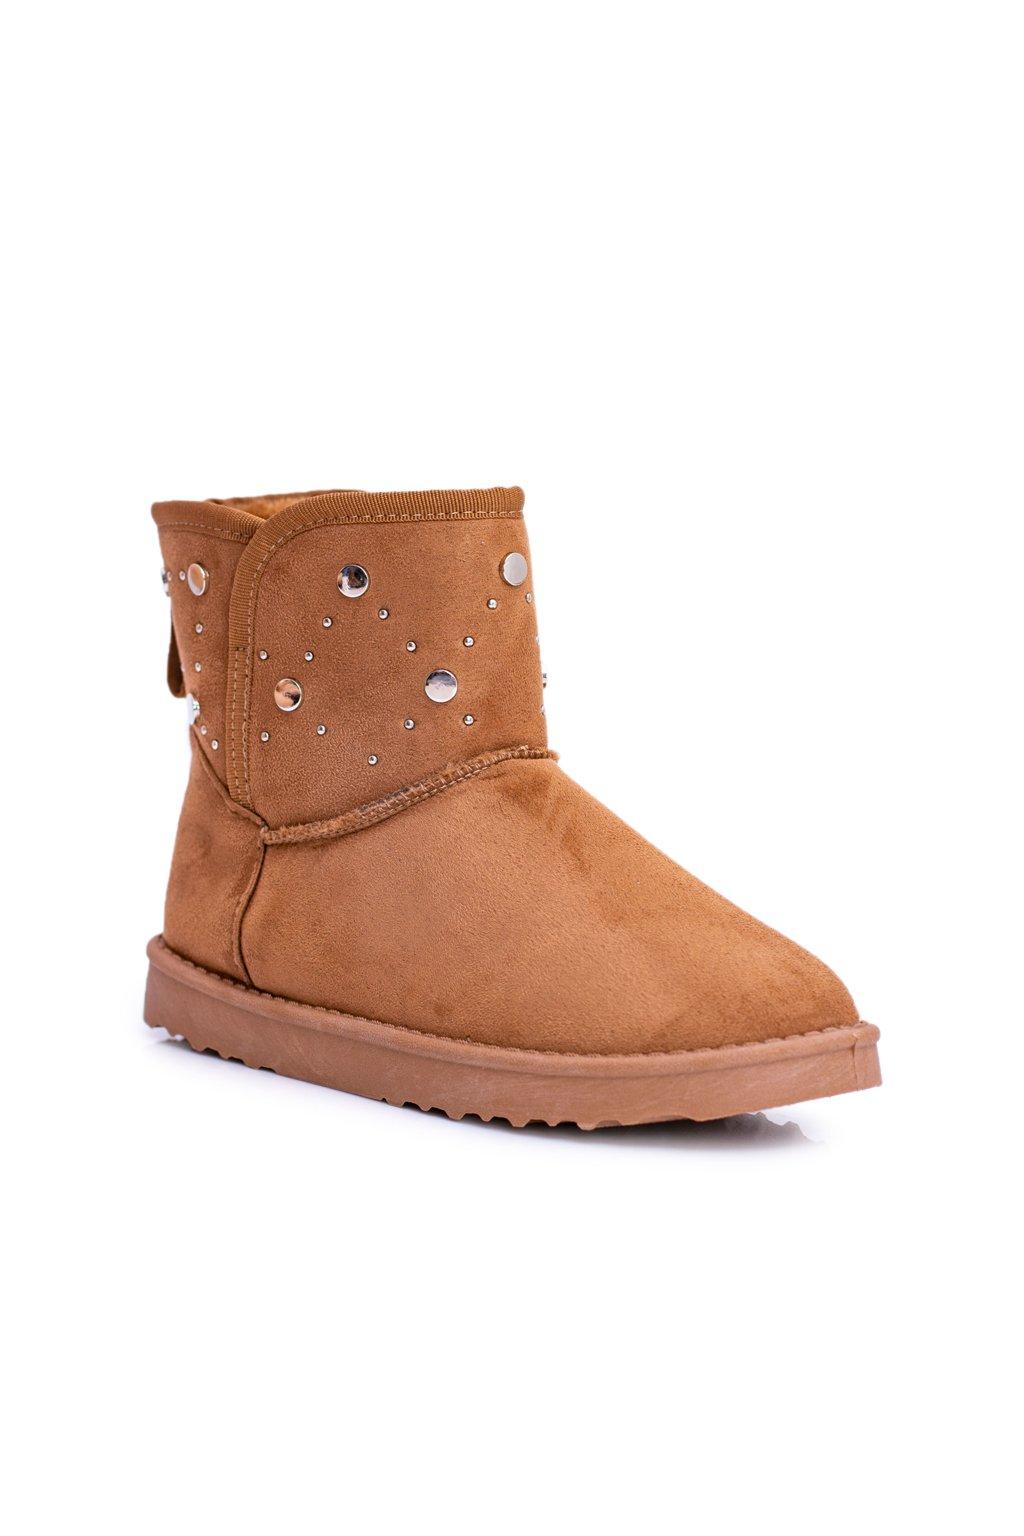 Dámske teplé snehule Semišové topánky ťavia B.gy